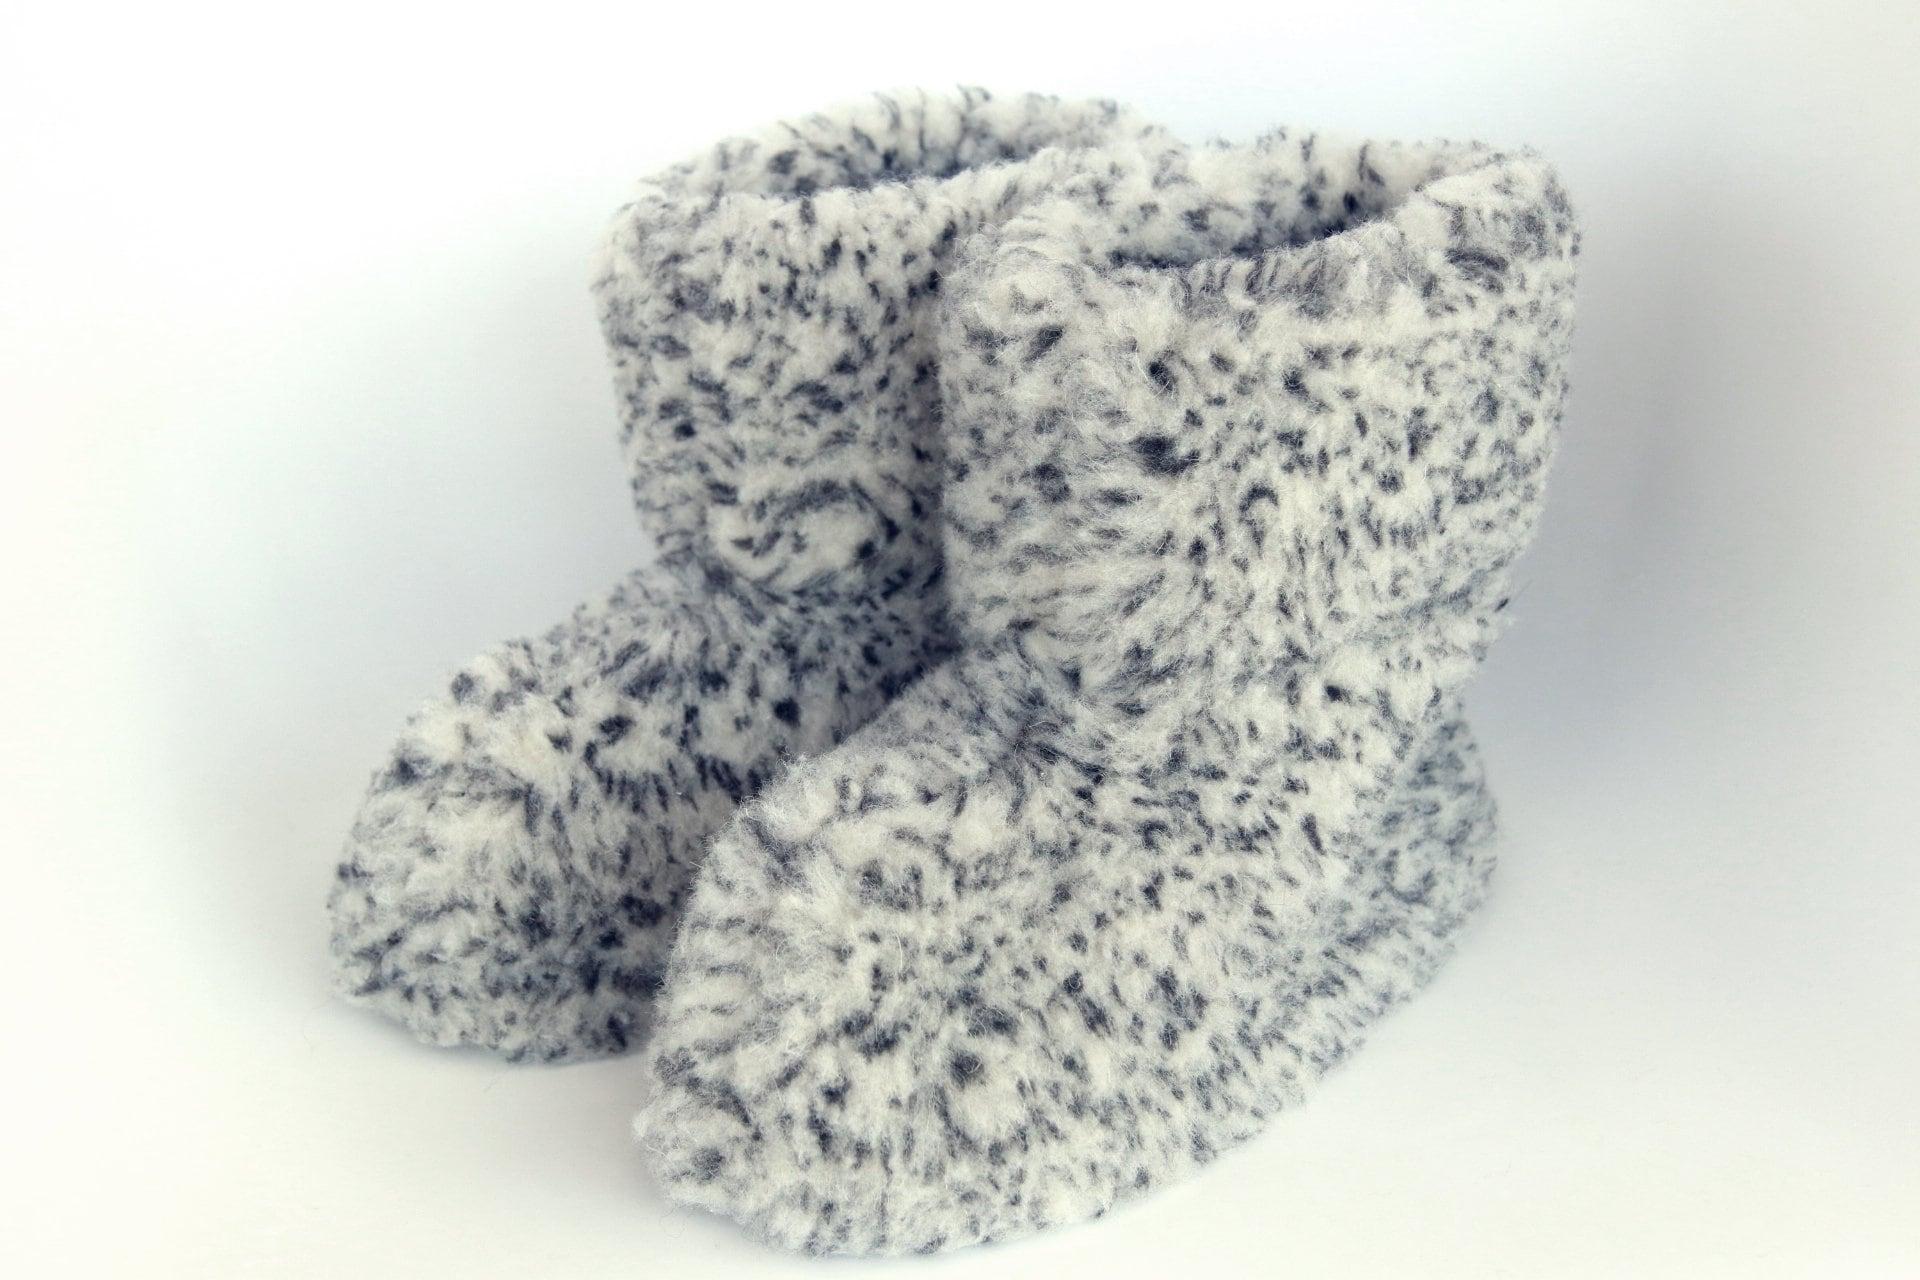 3434459f514044 Real Wool Slippers | Sheepskin Slippers | Medical Slippers | Women Men  Slippers | Warm slippers | Christmas Gift | Furry slippers. 1